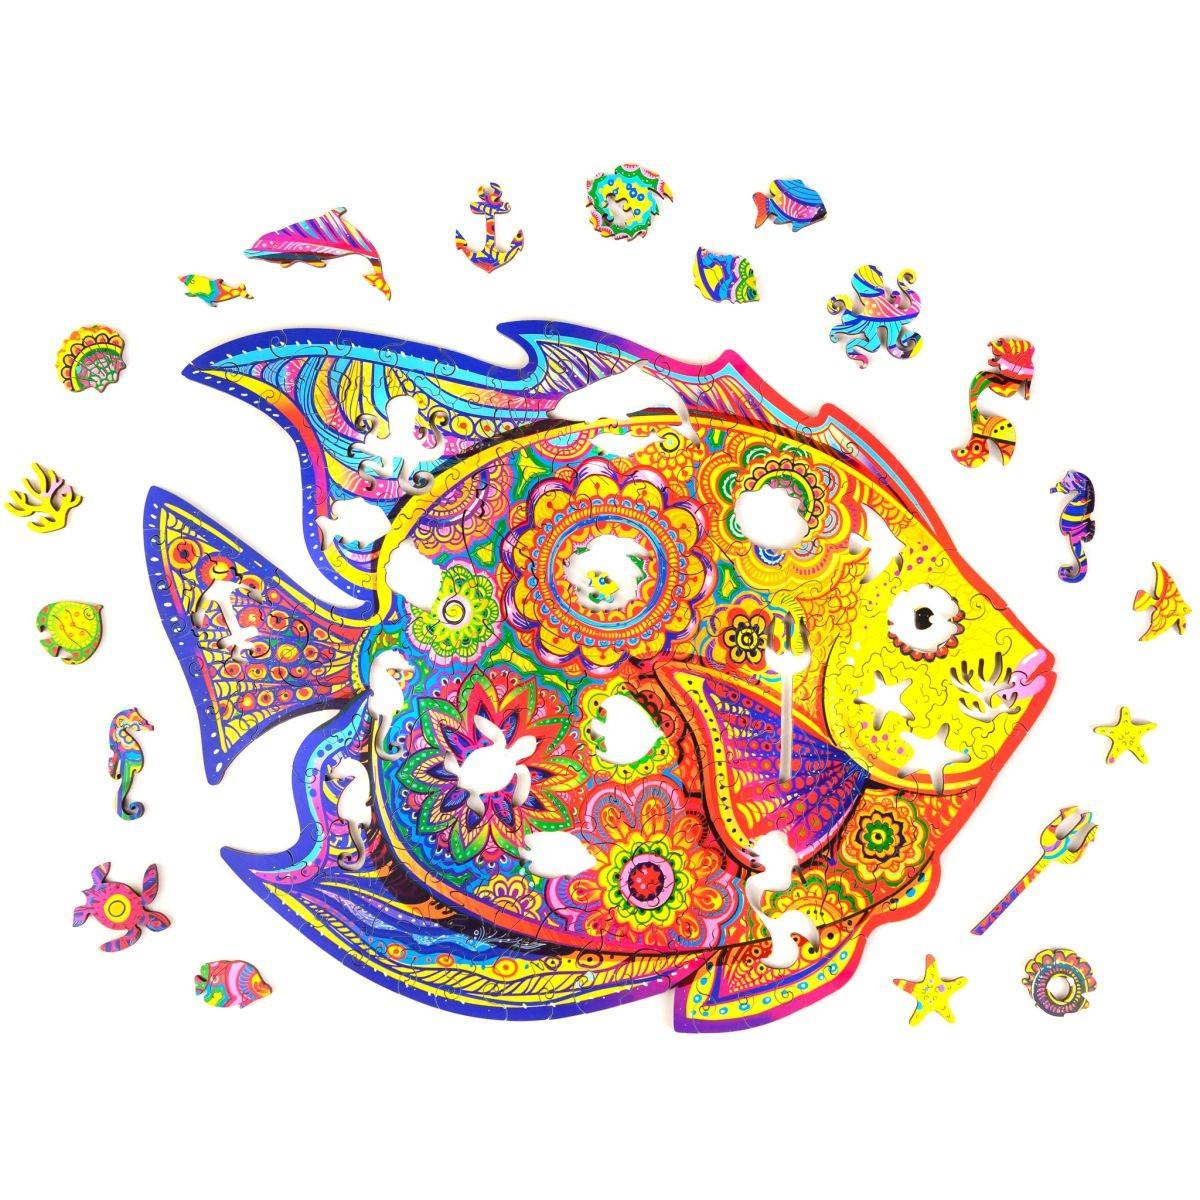 "Дерев'яні пазли з тваринами ""Fish wooden jigsaw puzzle"" А5, Рибка фігурні пазли з дерева для дітей (NS)"